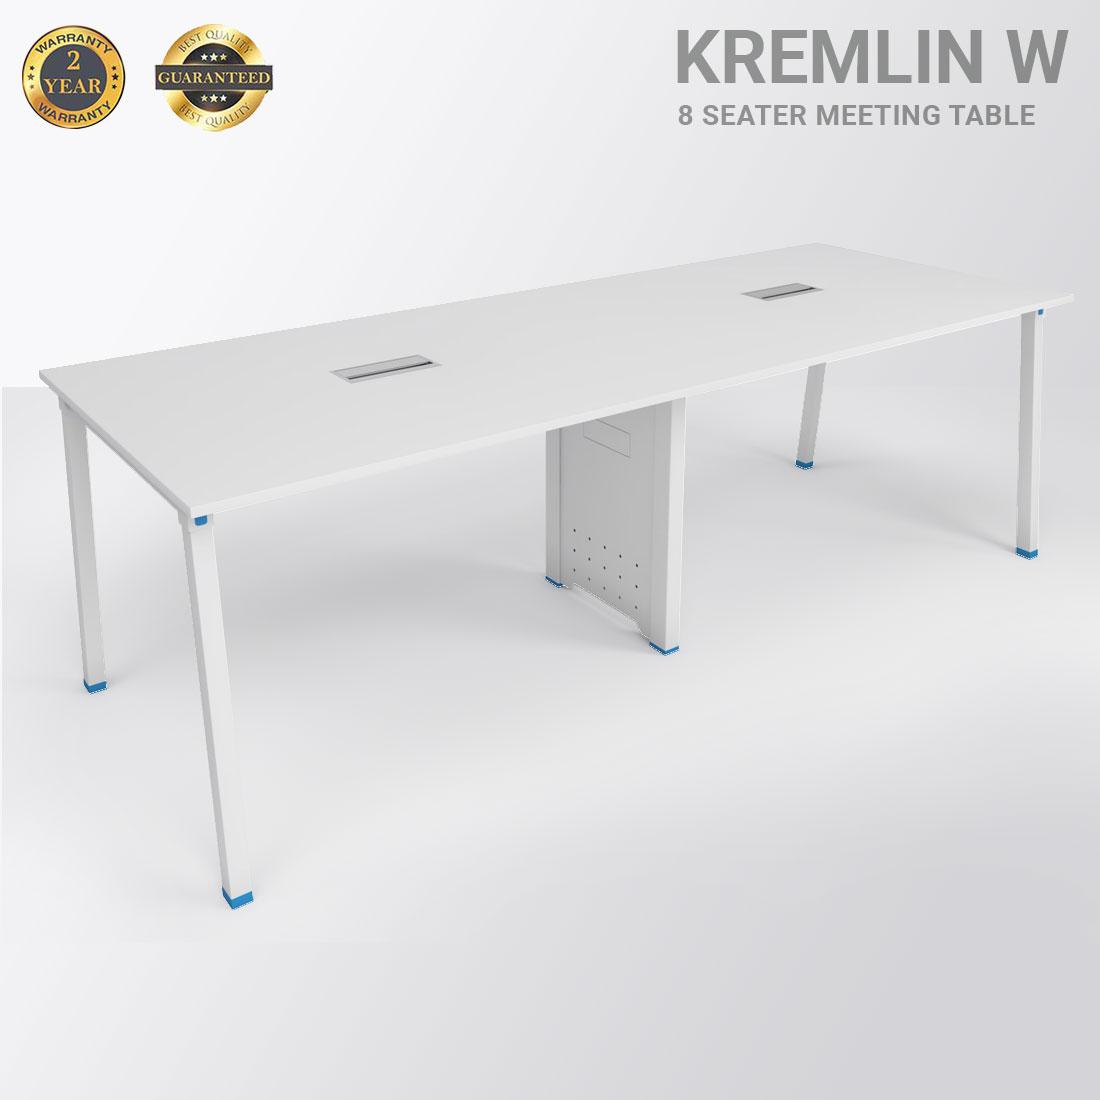 KREMLIN W 8 SEATER